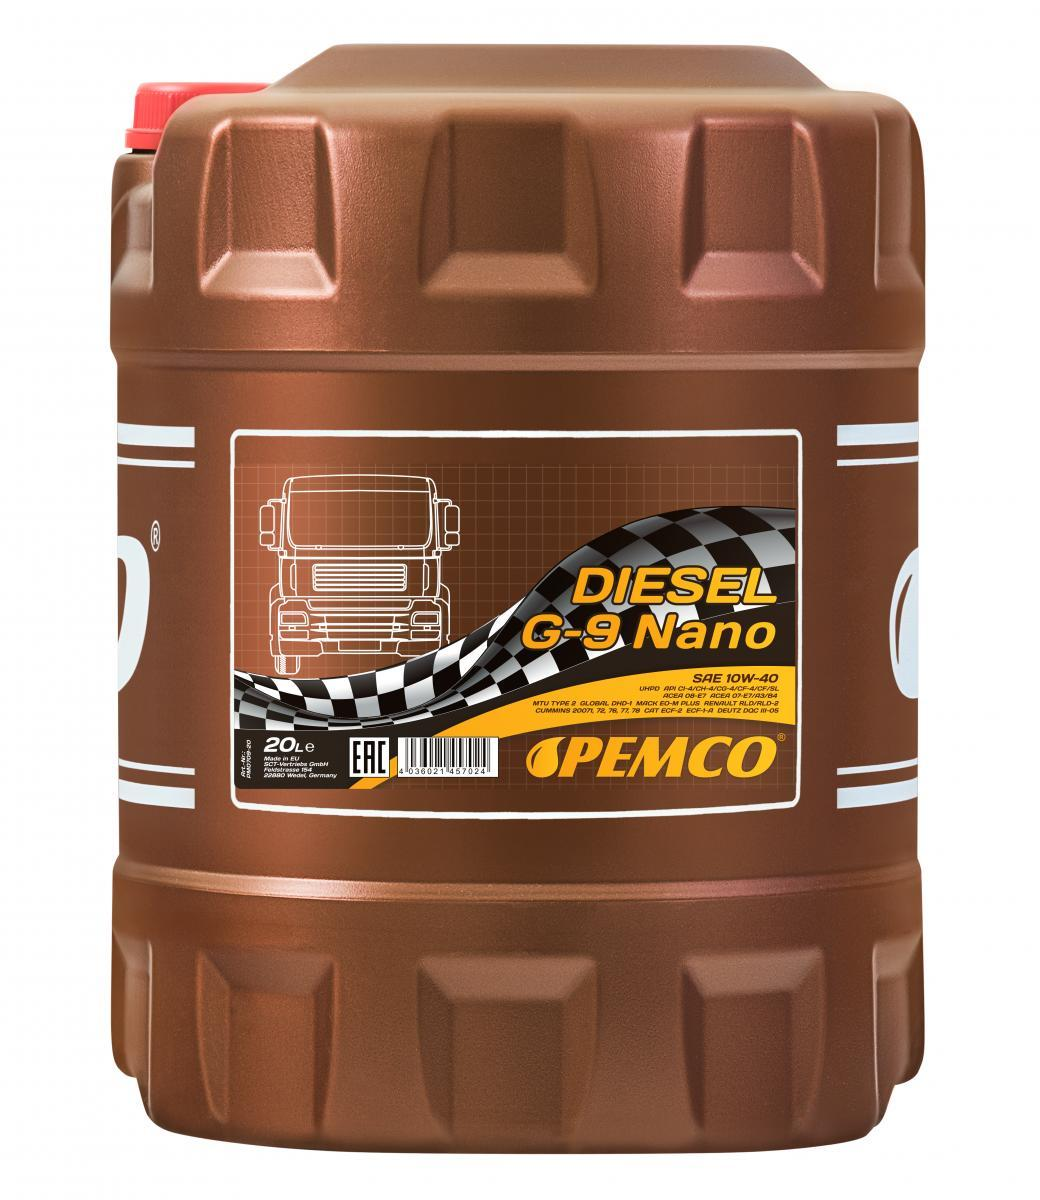 PEMCO Truck UHPD, DIESEL G-9 NANO PM0709-20 Motoröl